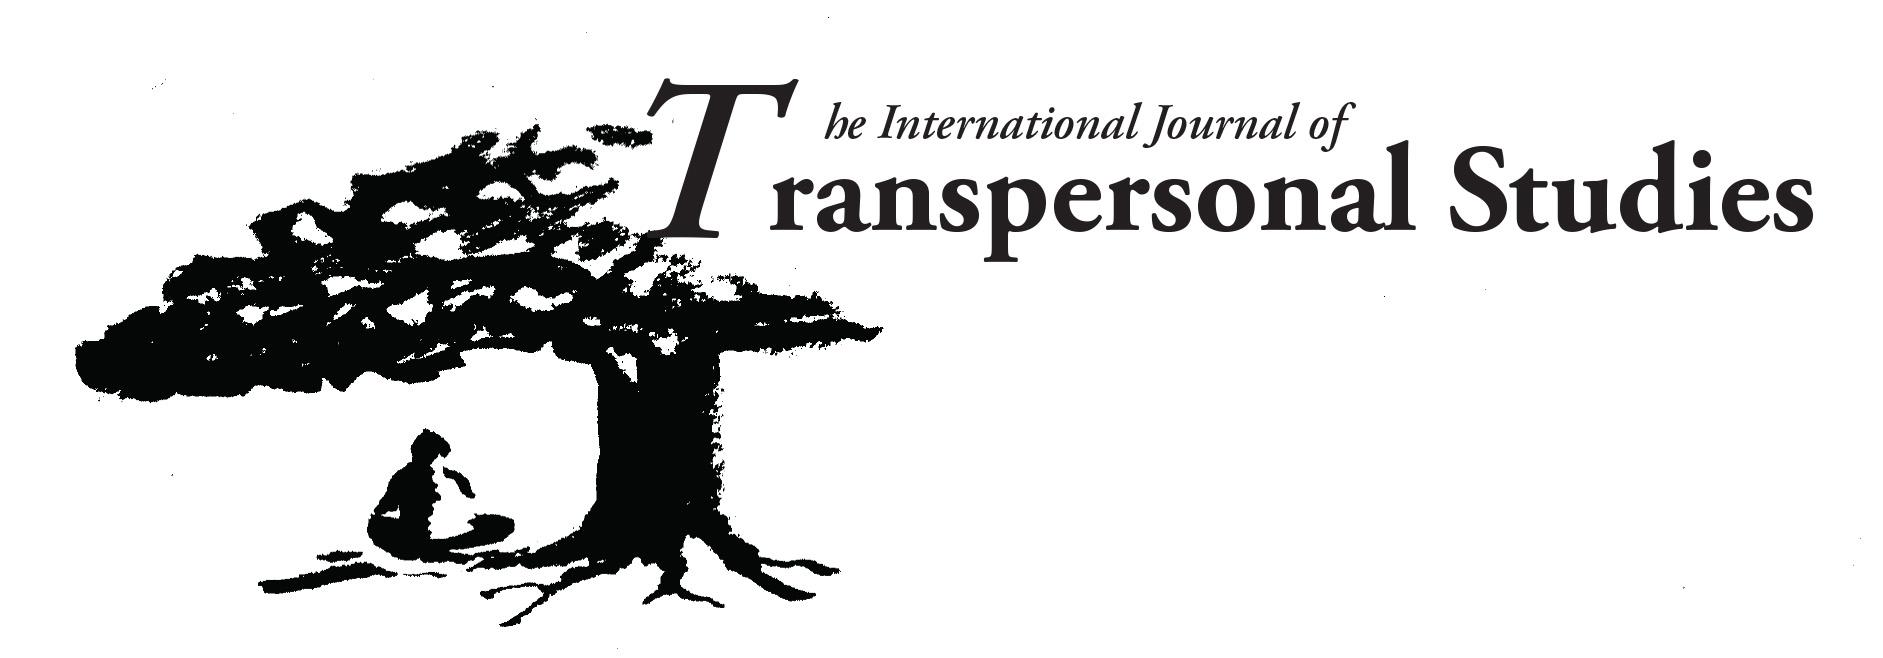 The International Journal of Transpersonal Studies